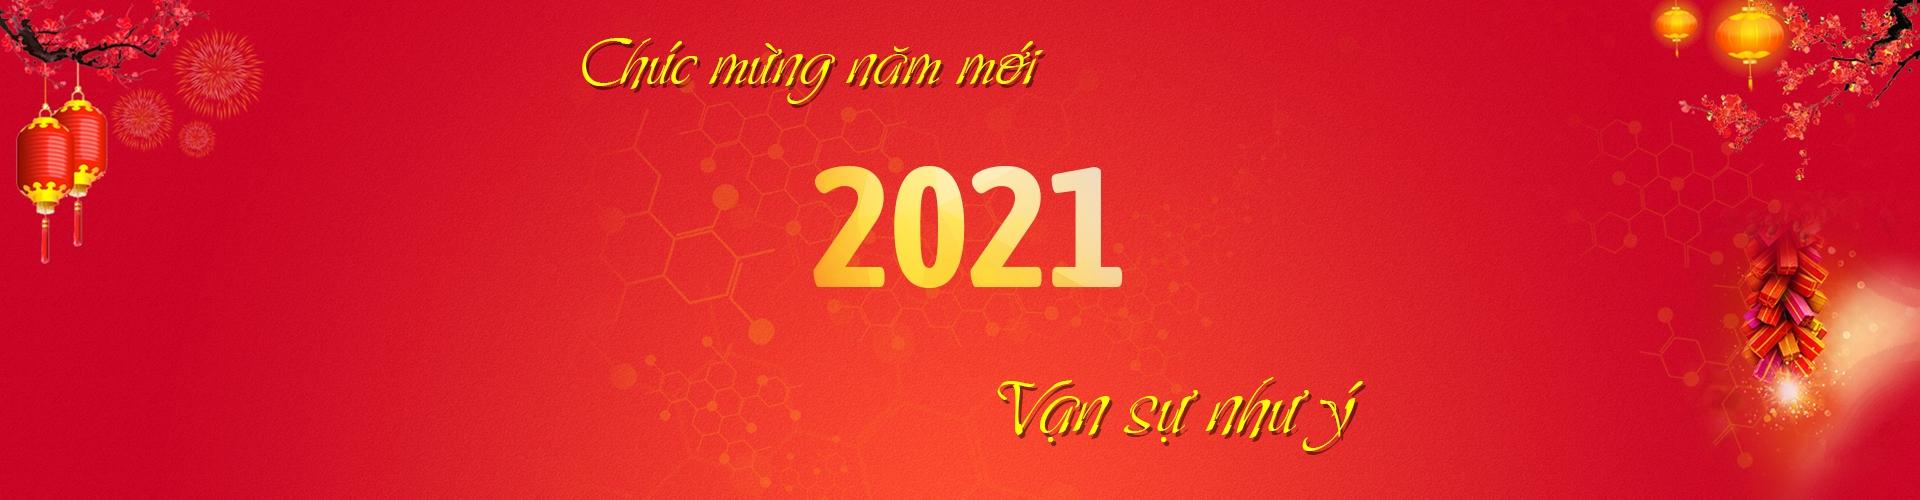 Banner xuân 2021